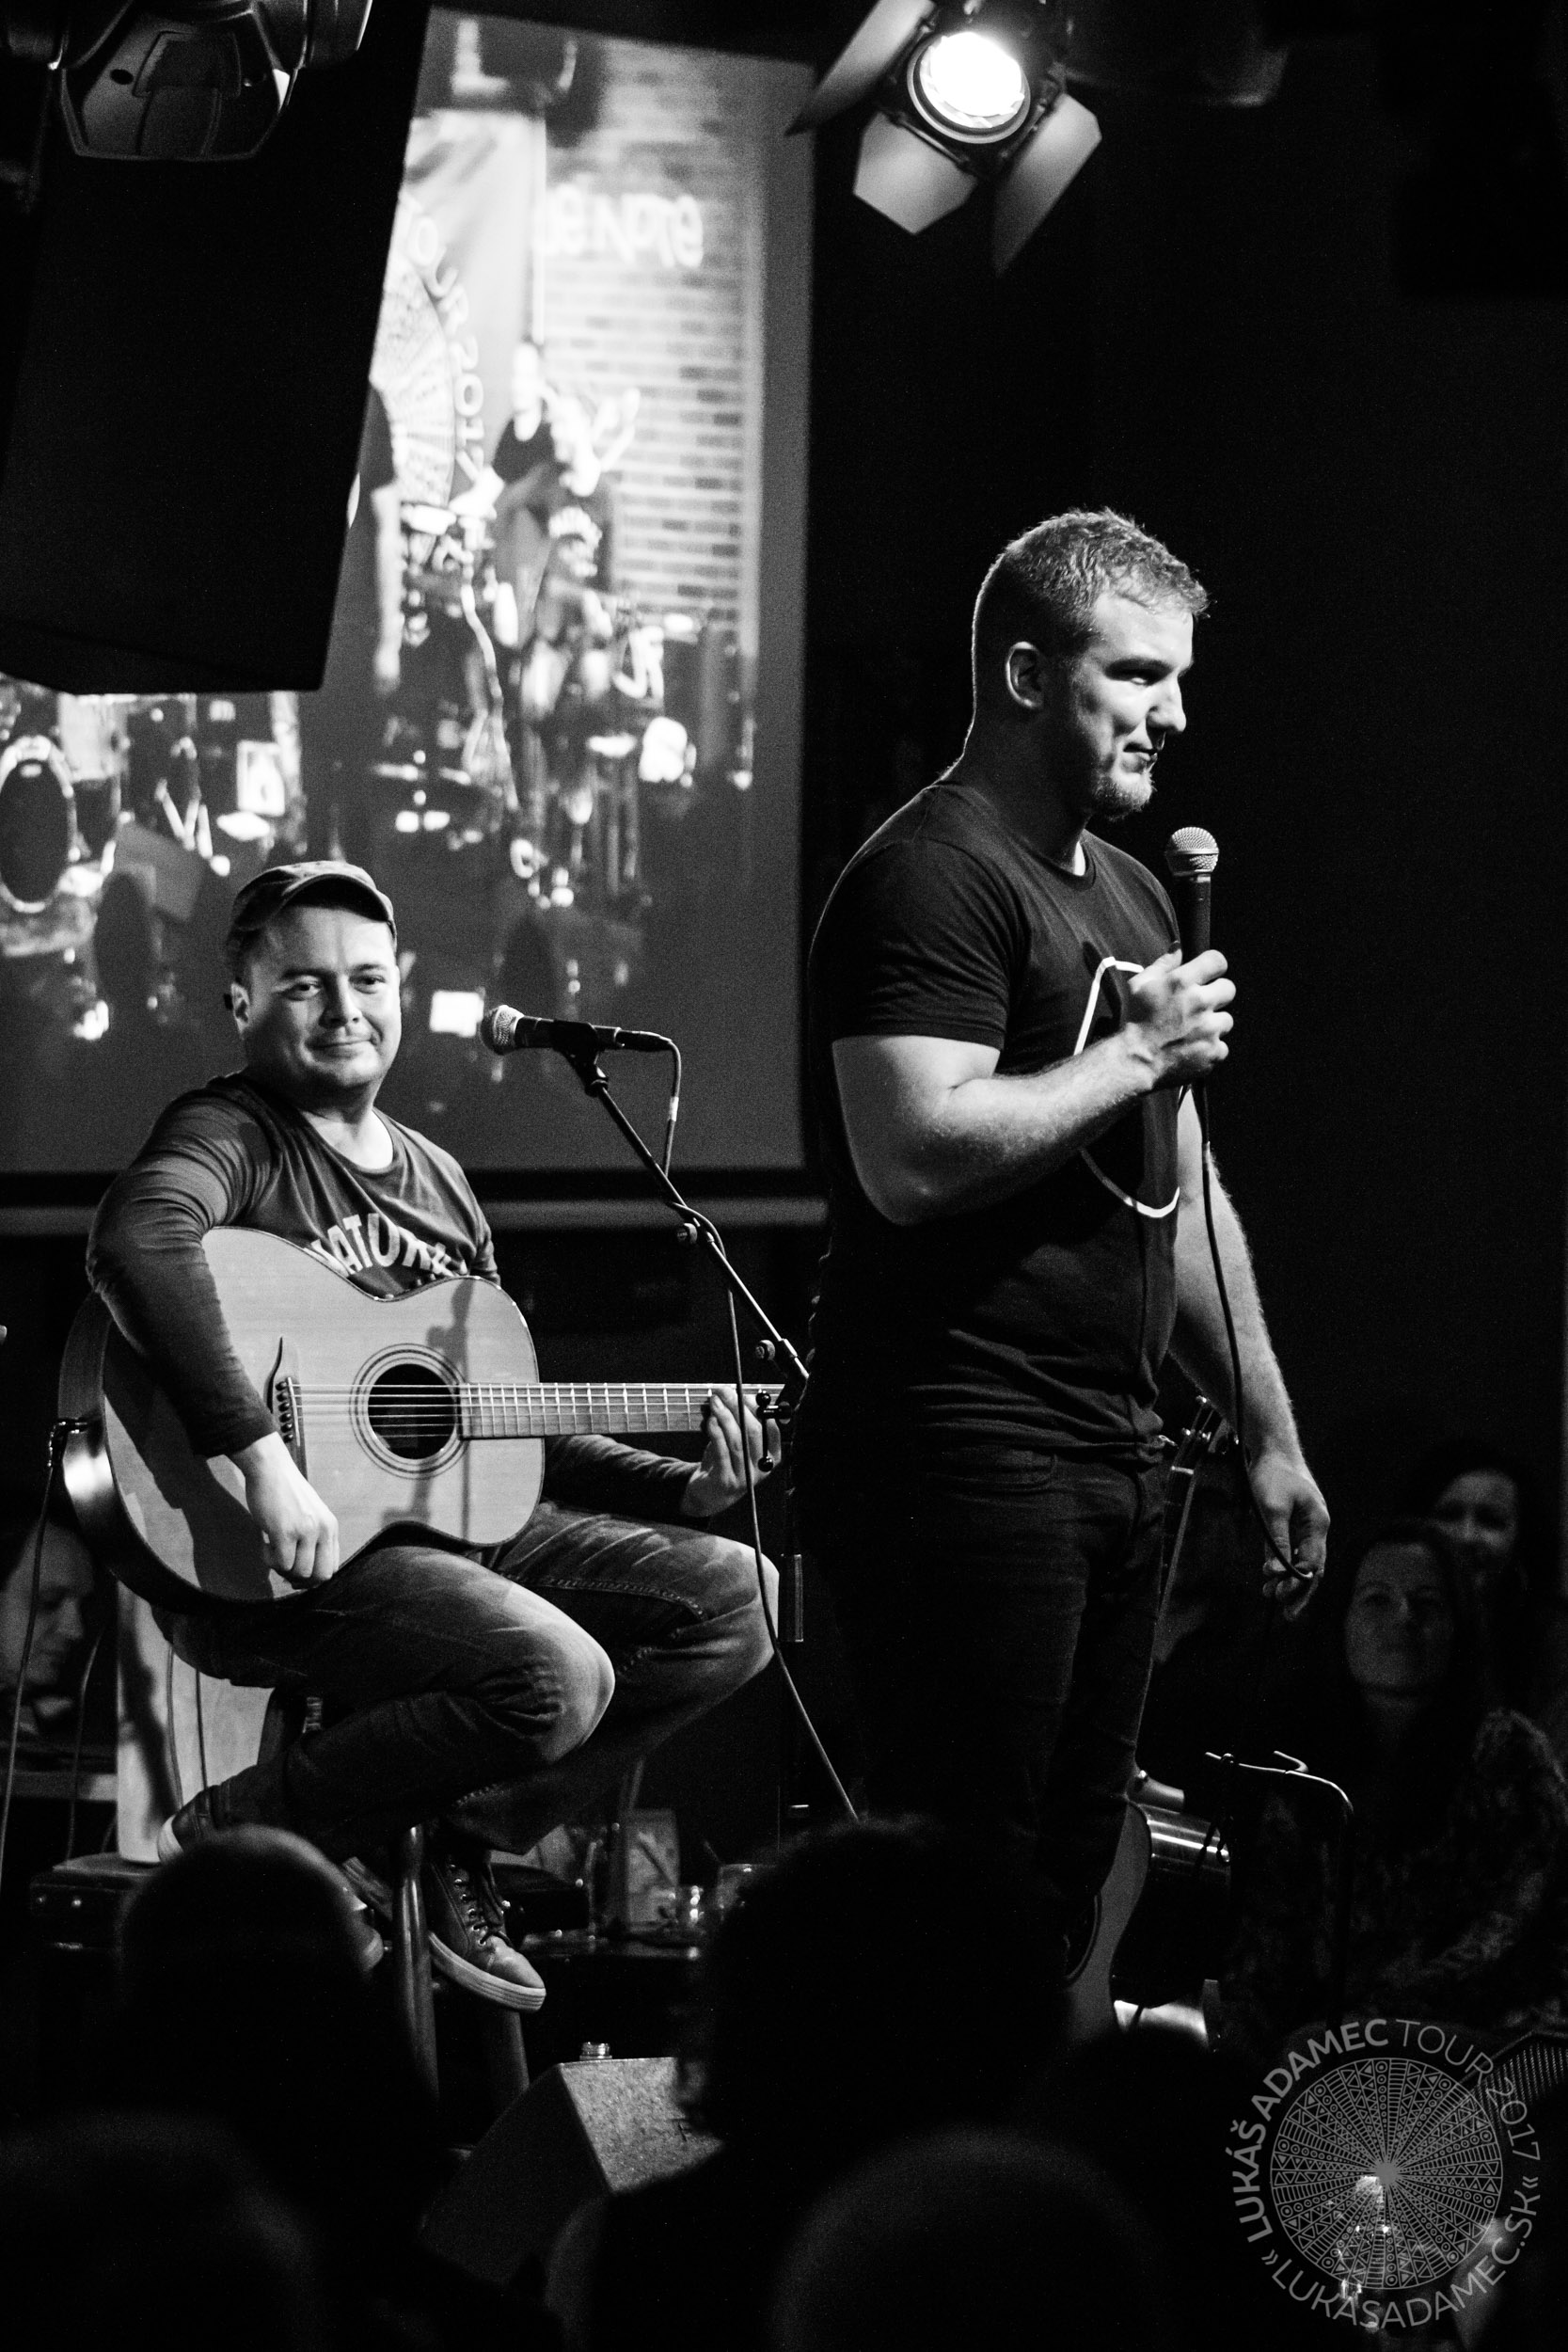 Lukáš Adamec TOUR 2017 - Blue Note, Nové Mesto nad Váhom - Tomi Okres